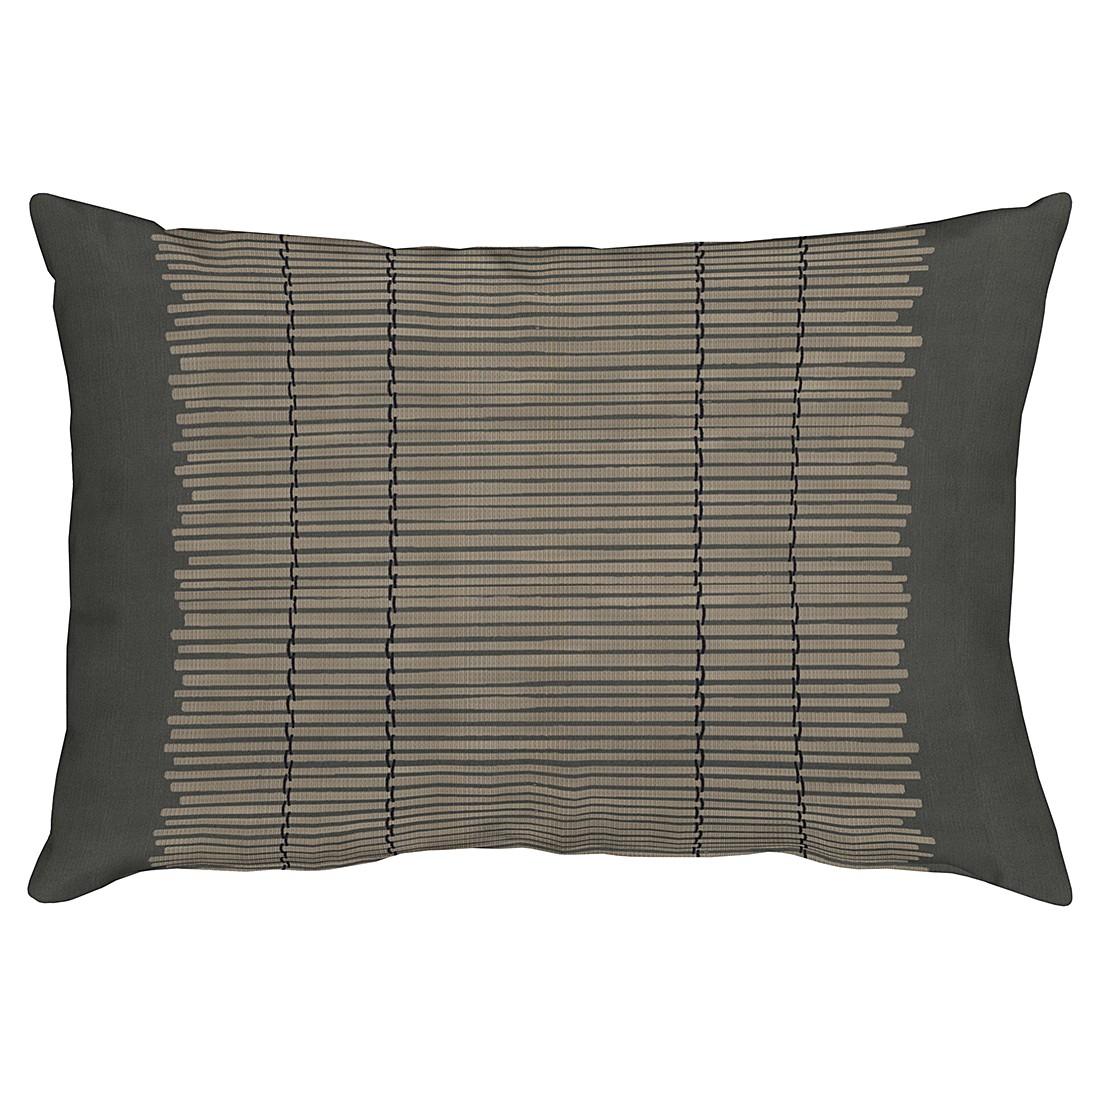 Kissen Loft I – Grau – 35 x 50 cm, Apelt günstig online kaufen